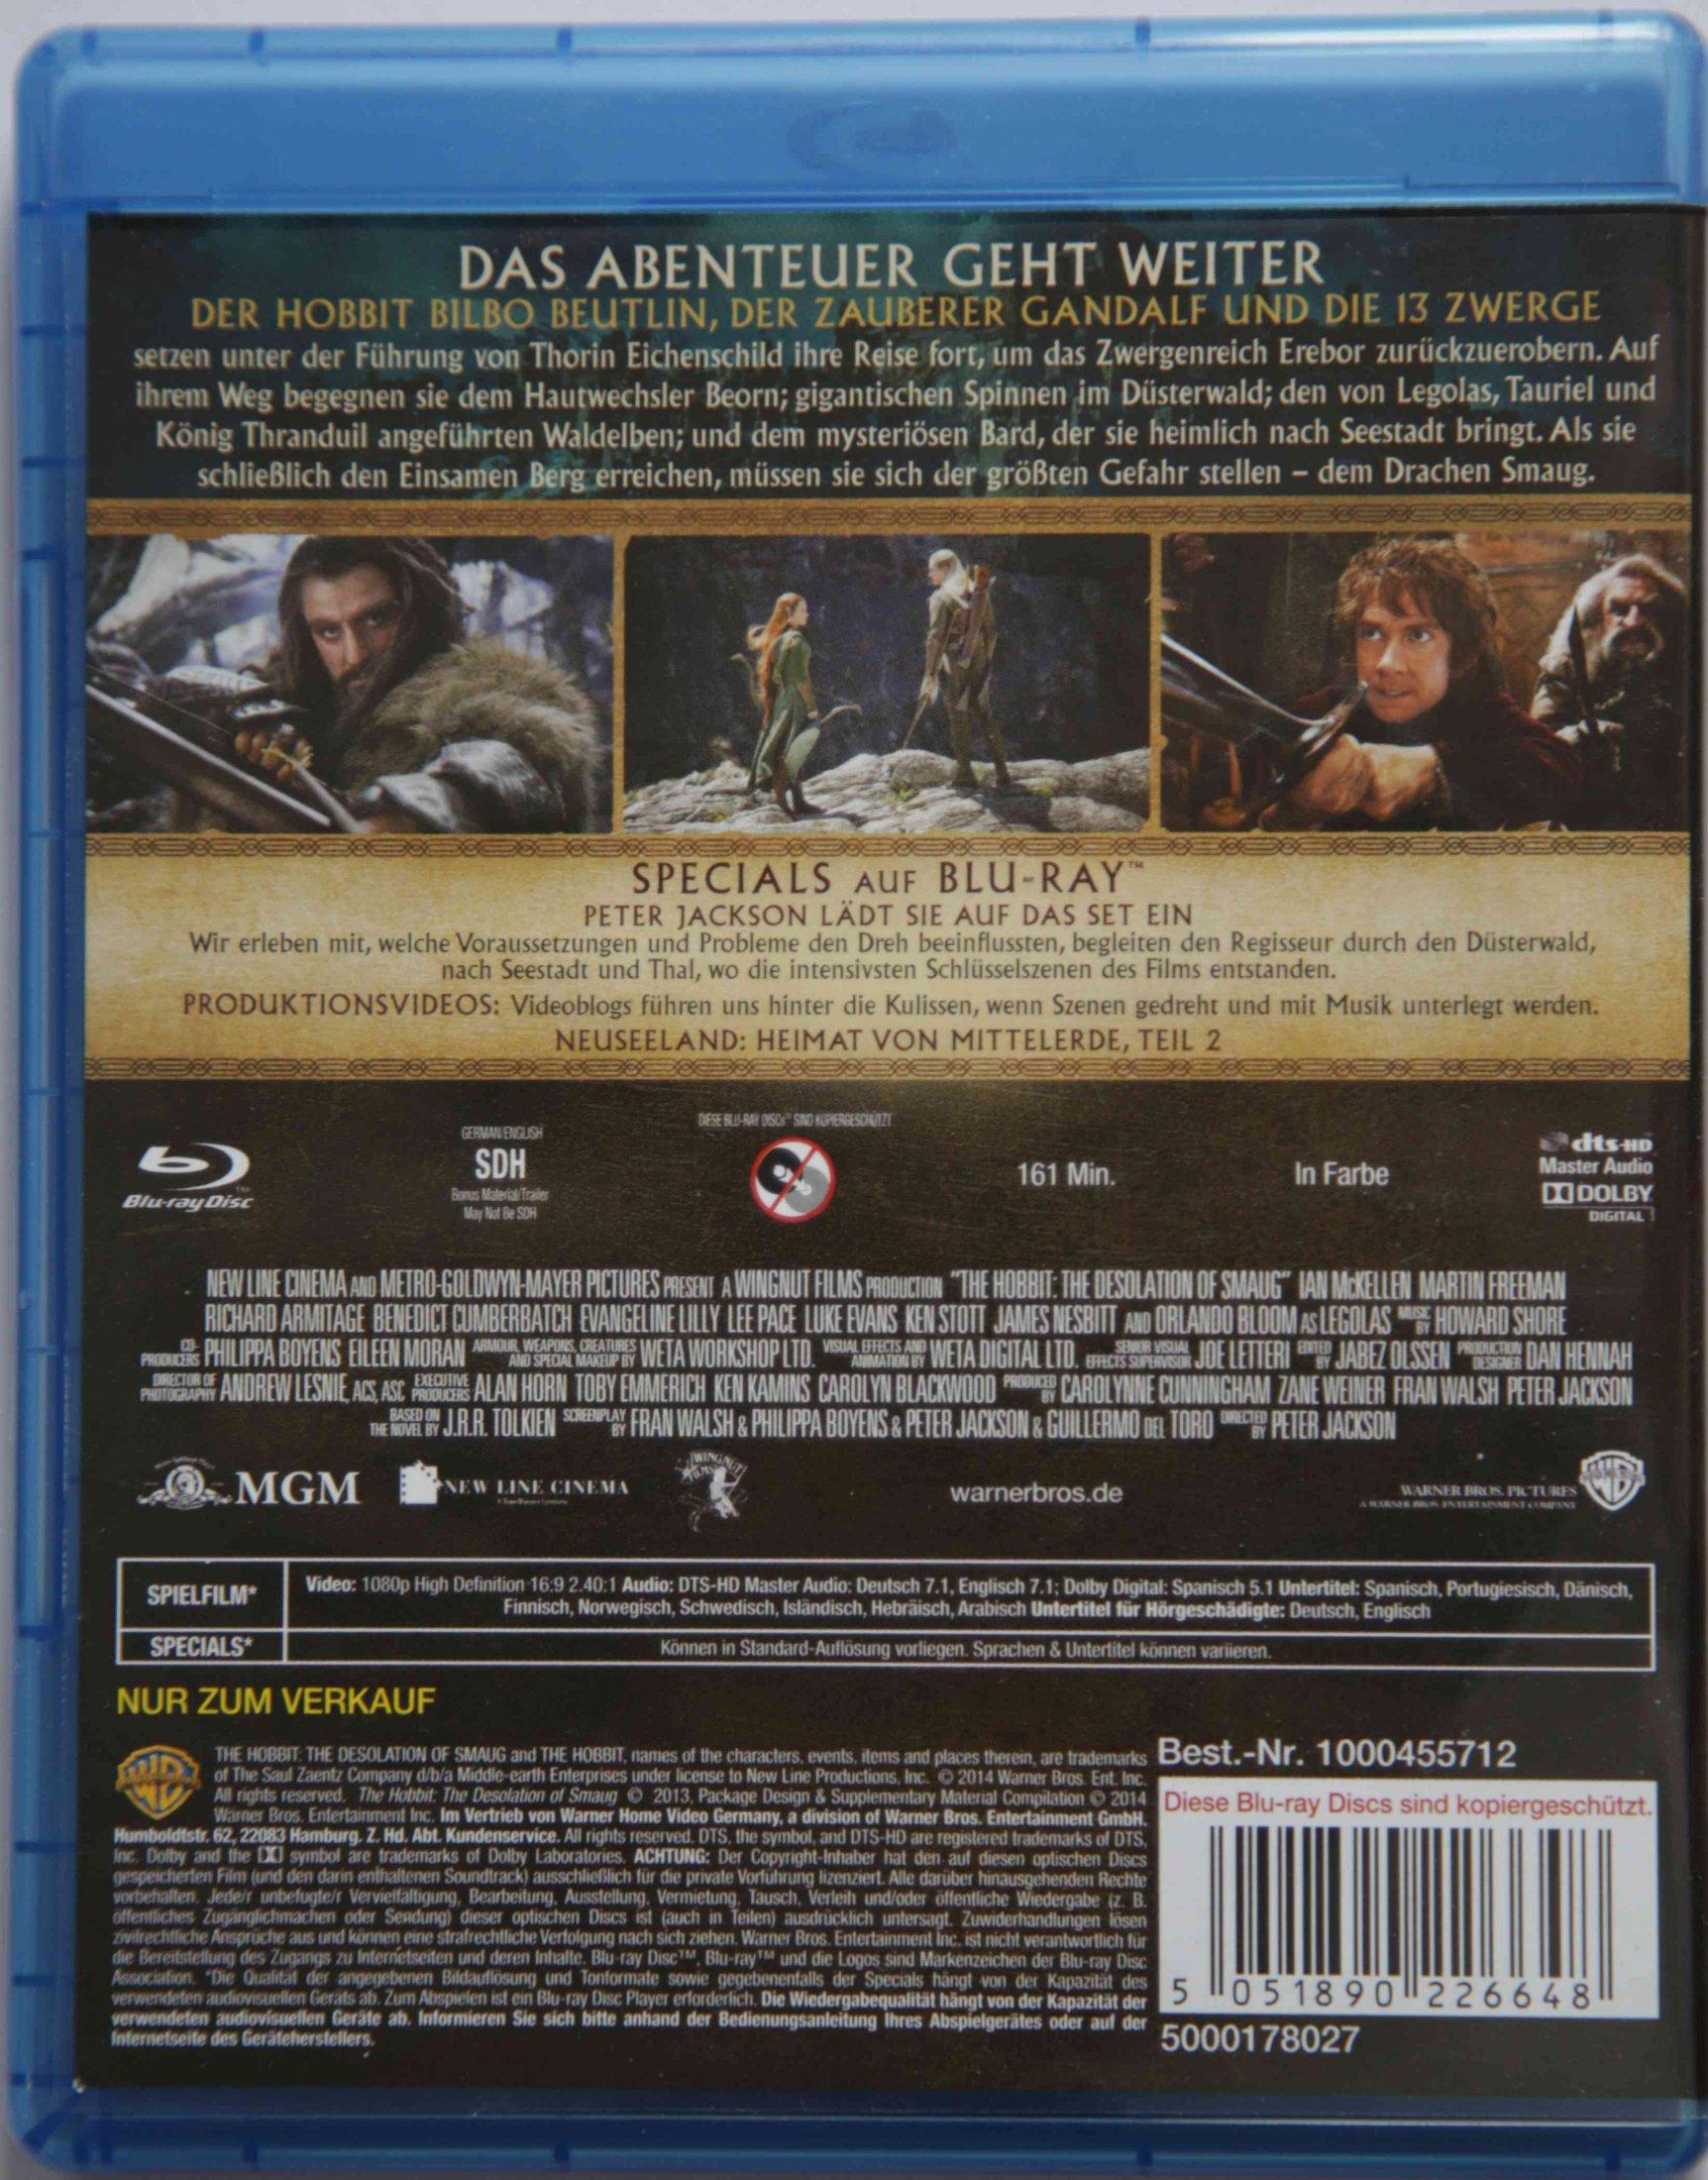 Der Hobbit - Smaugs Einöde Back